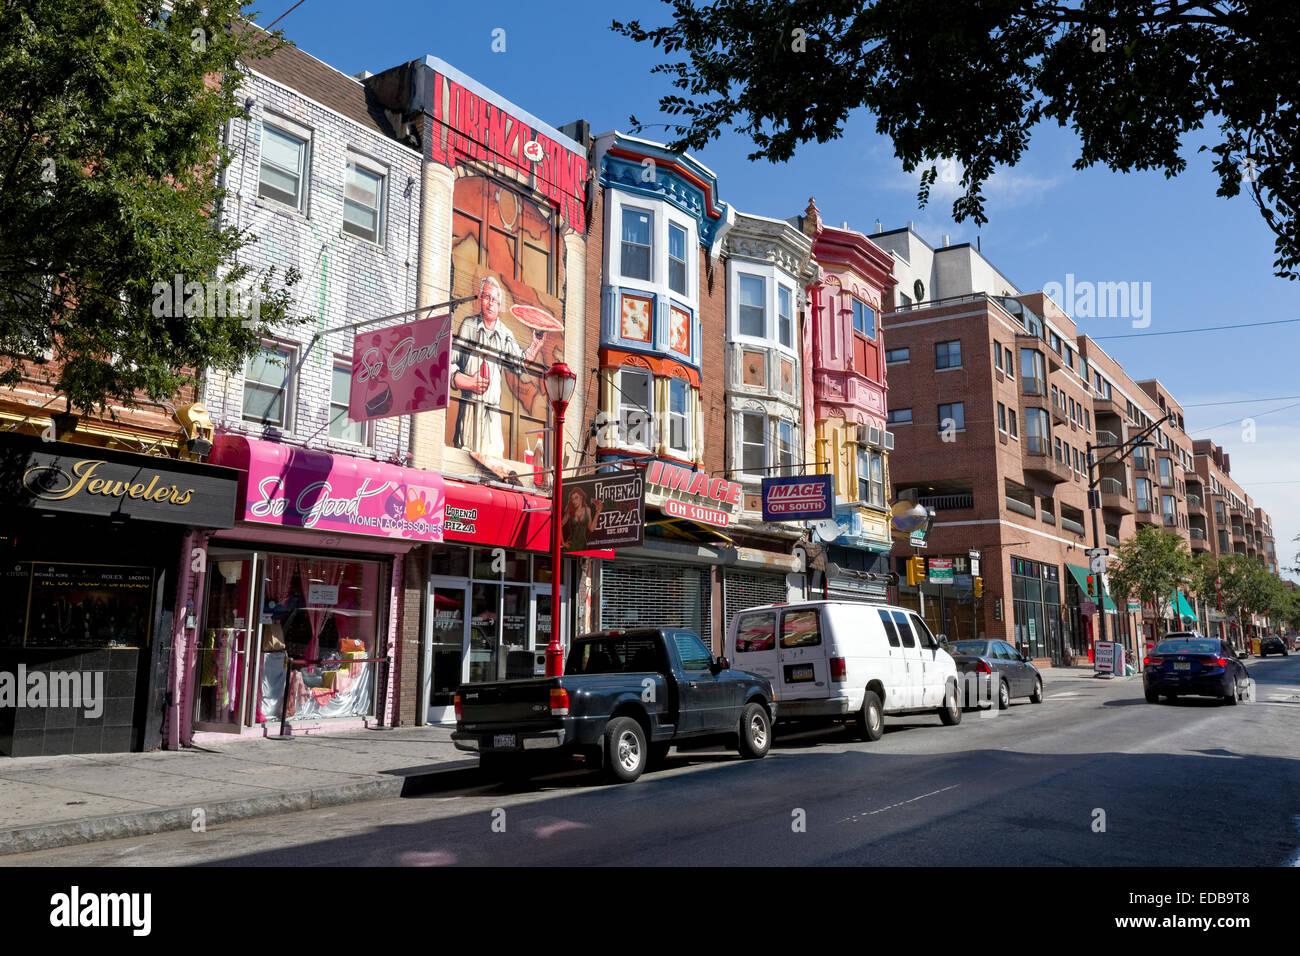 South Street, Philadelphie, Pennsylvanie Photo Stock